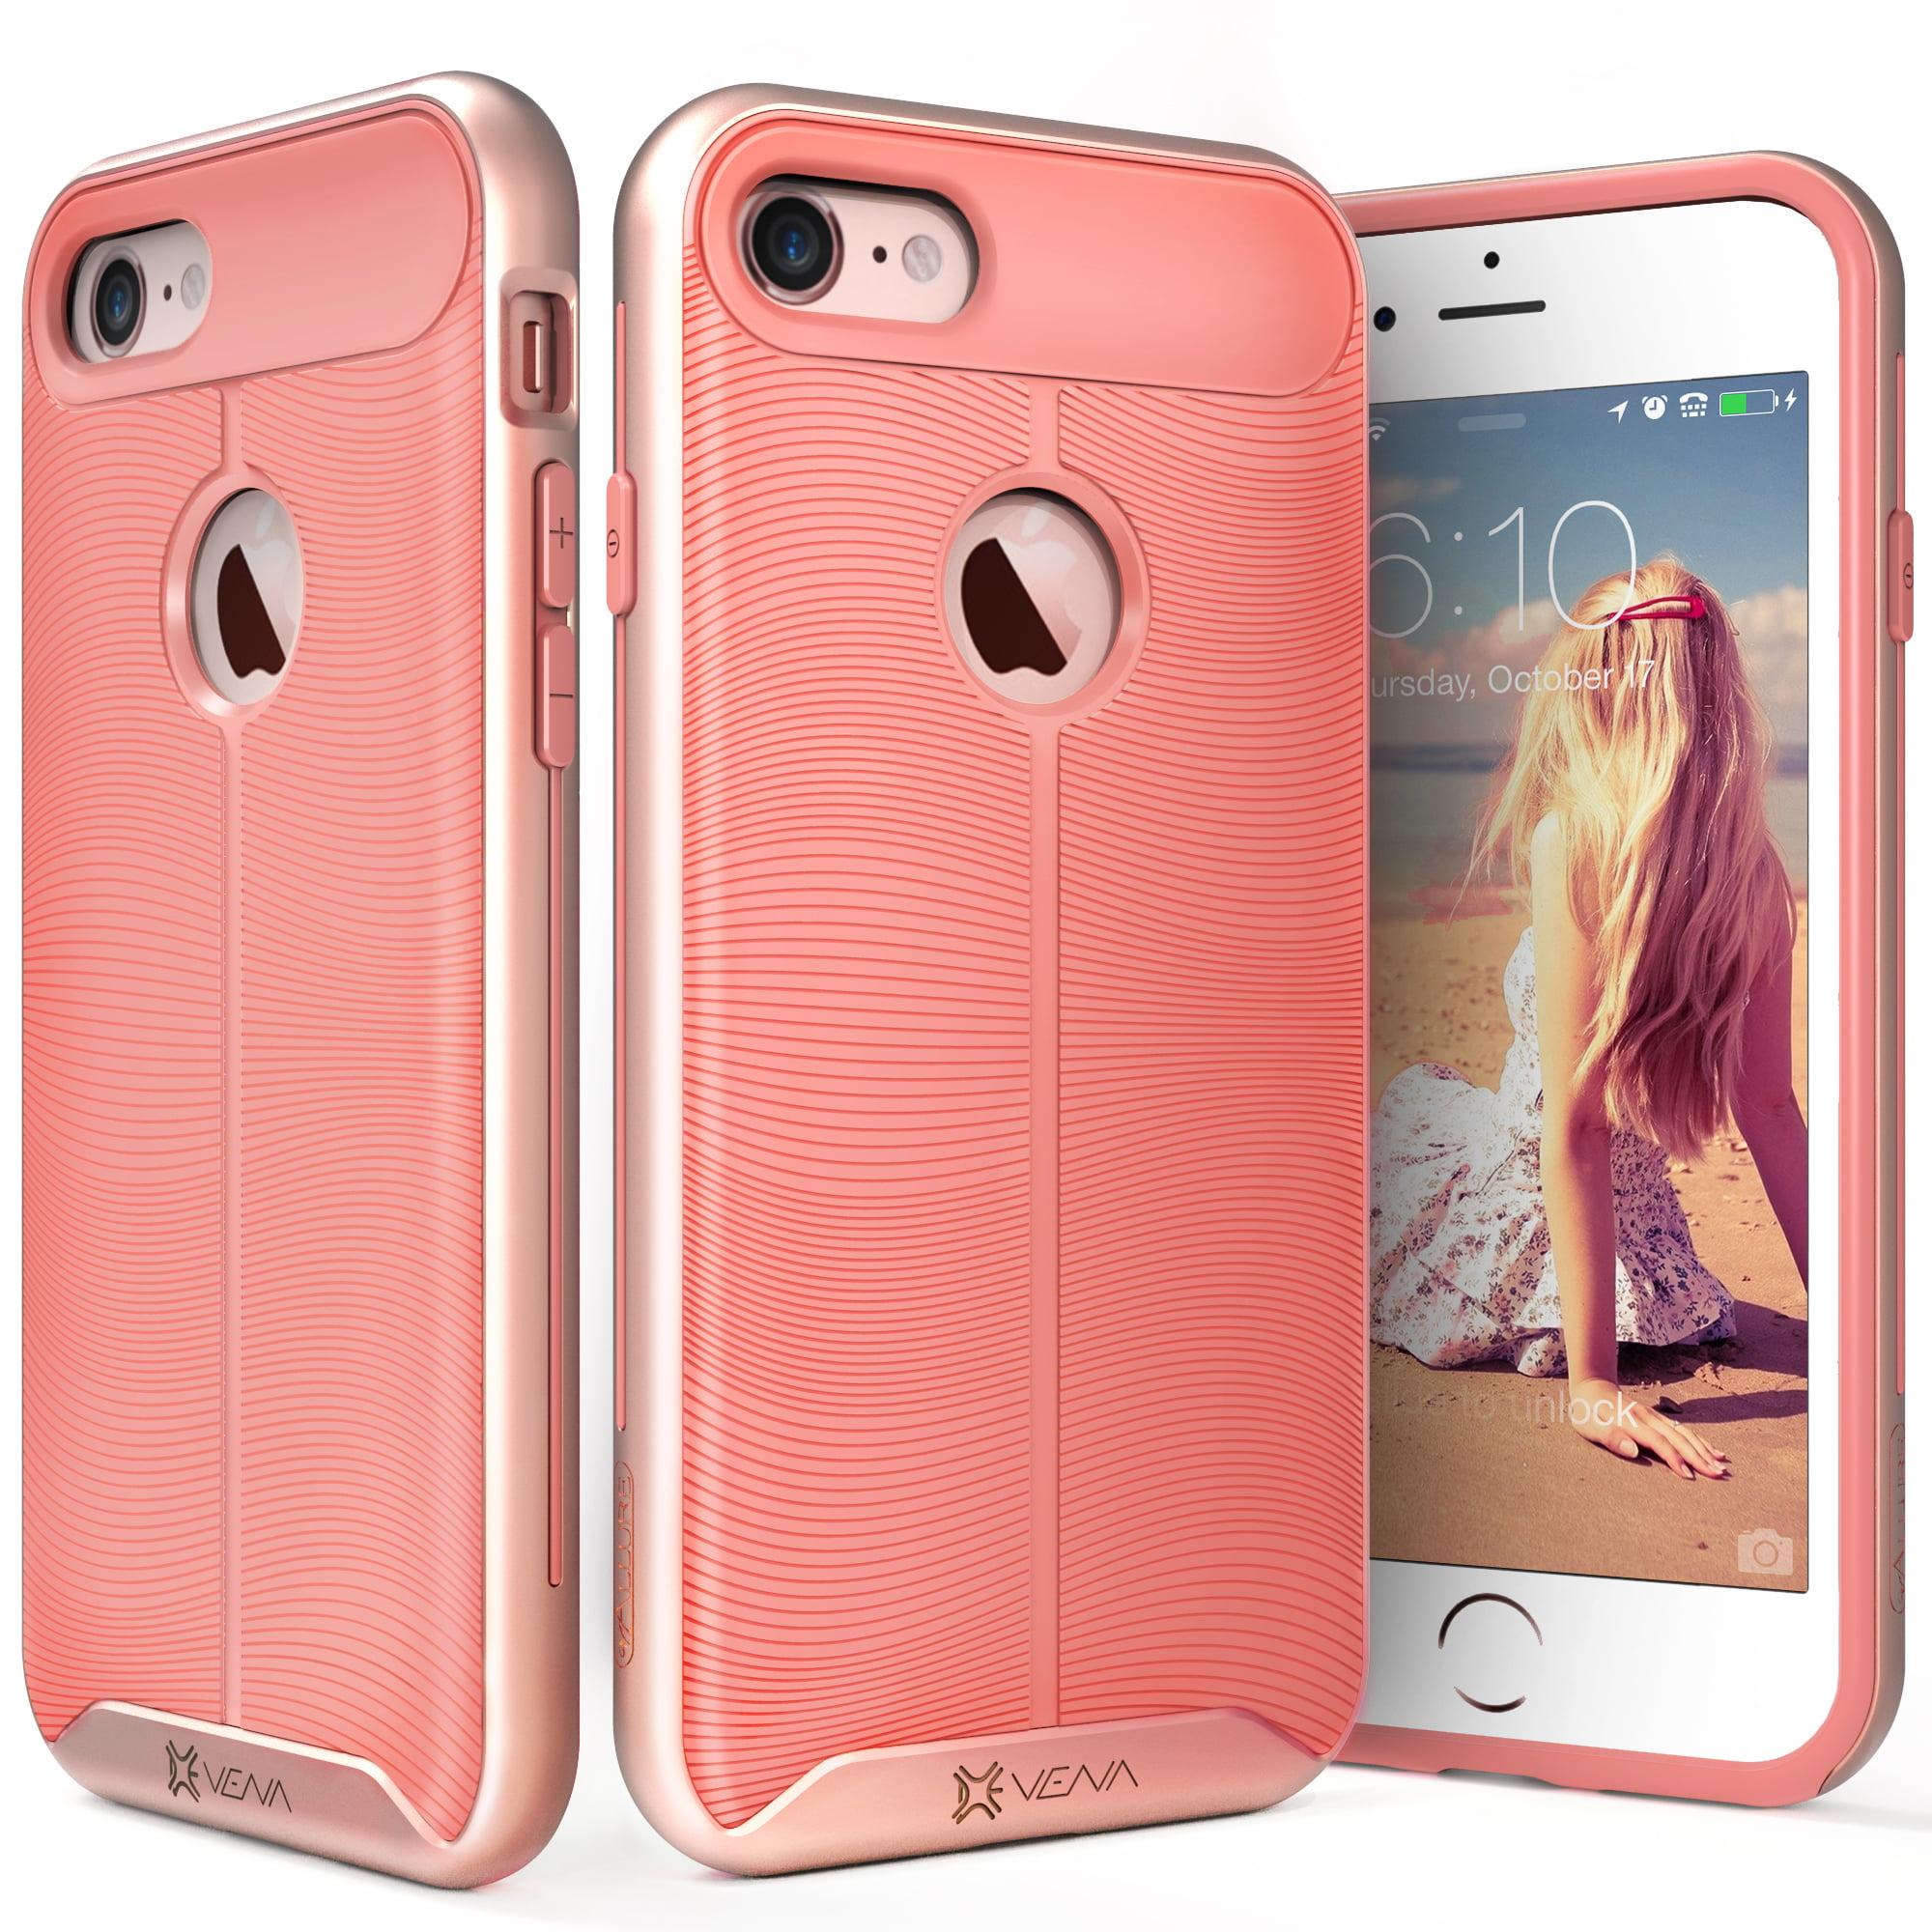 Vena [vAllure] Hybrid Wave Design Slim Case Cover Skin for Apple iPhone 7 7 Plus